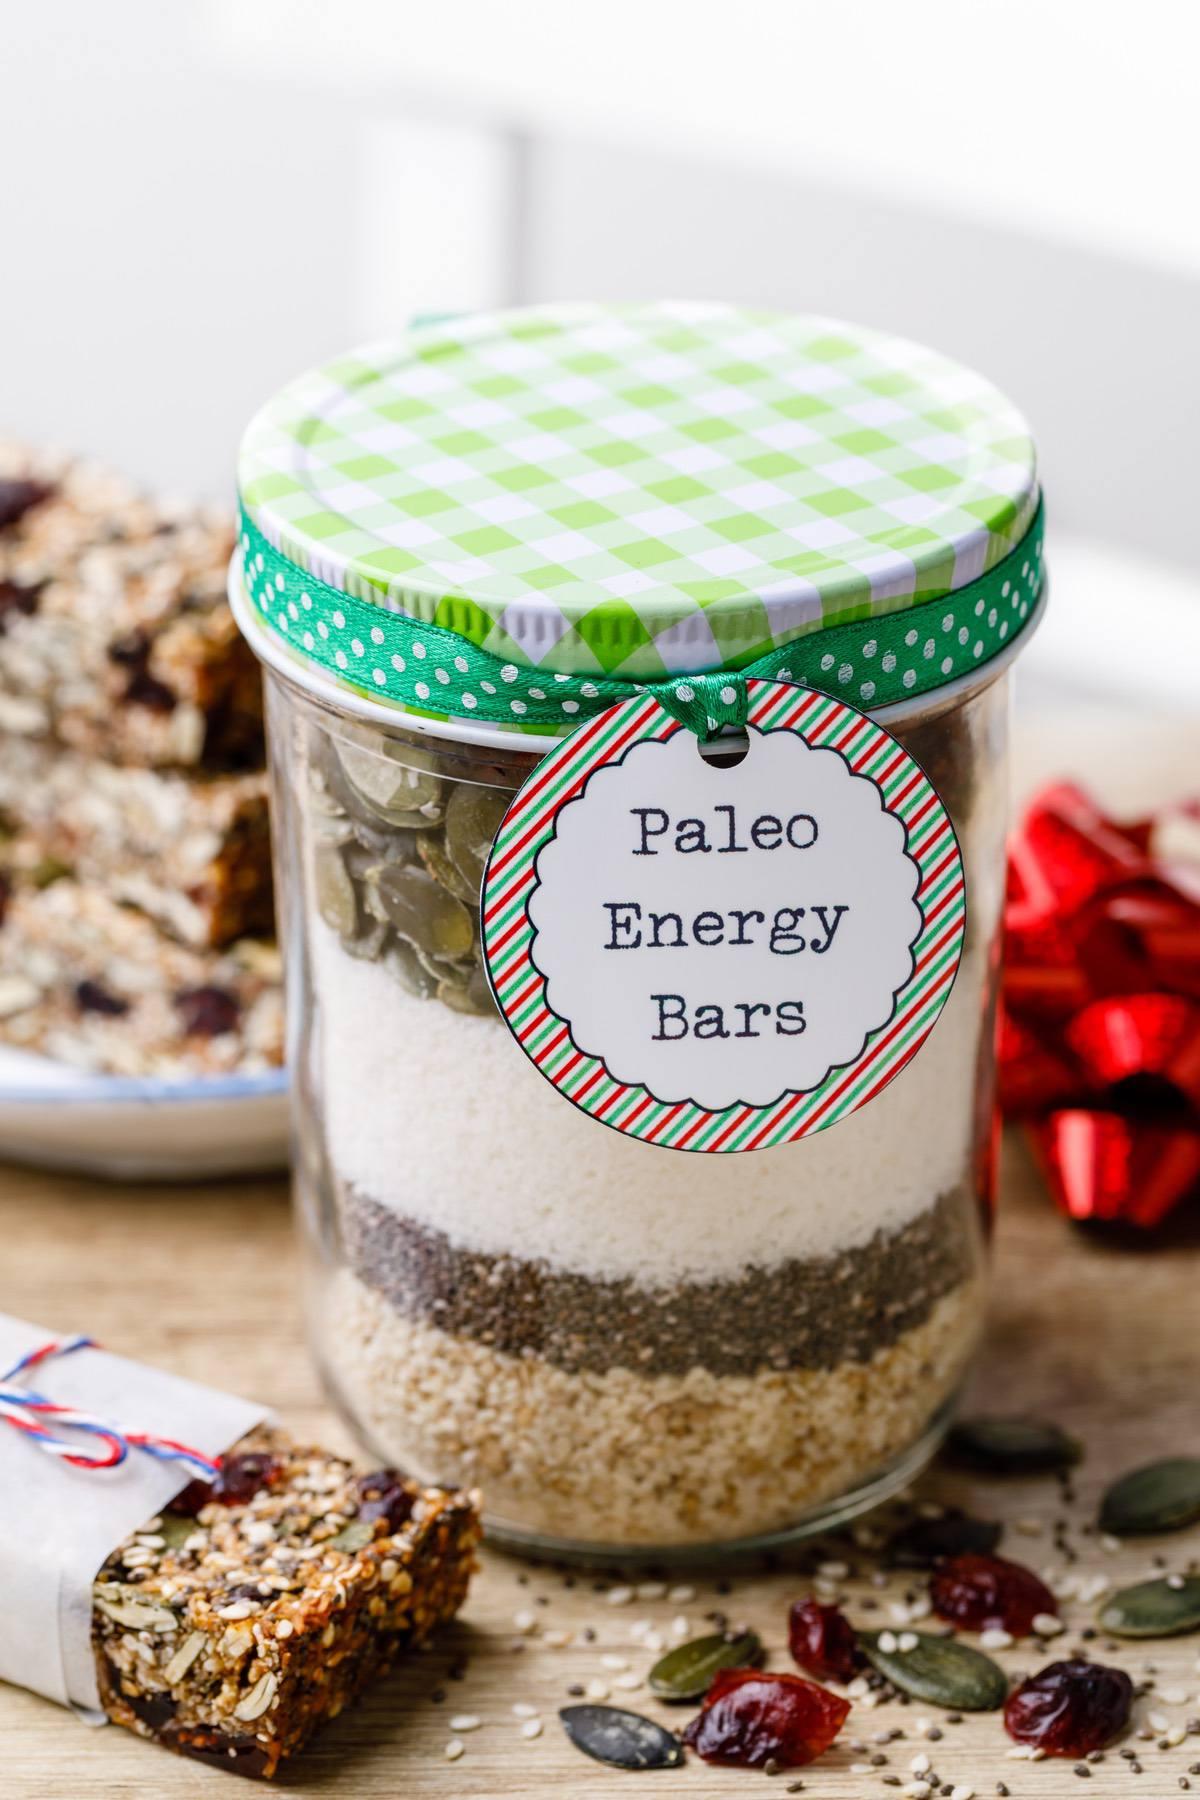 Paleo Energy Bars